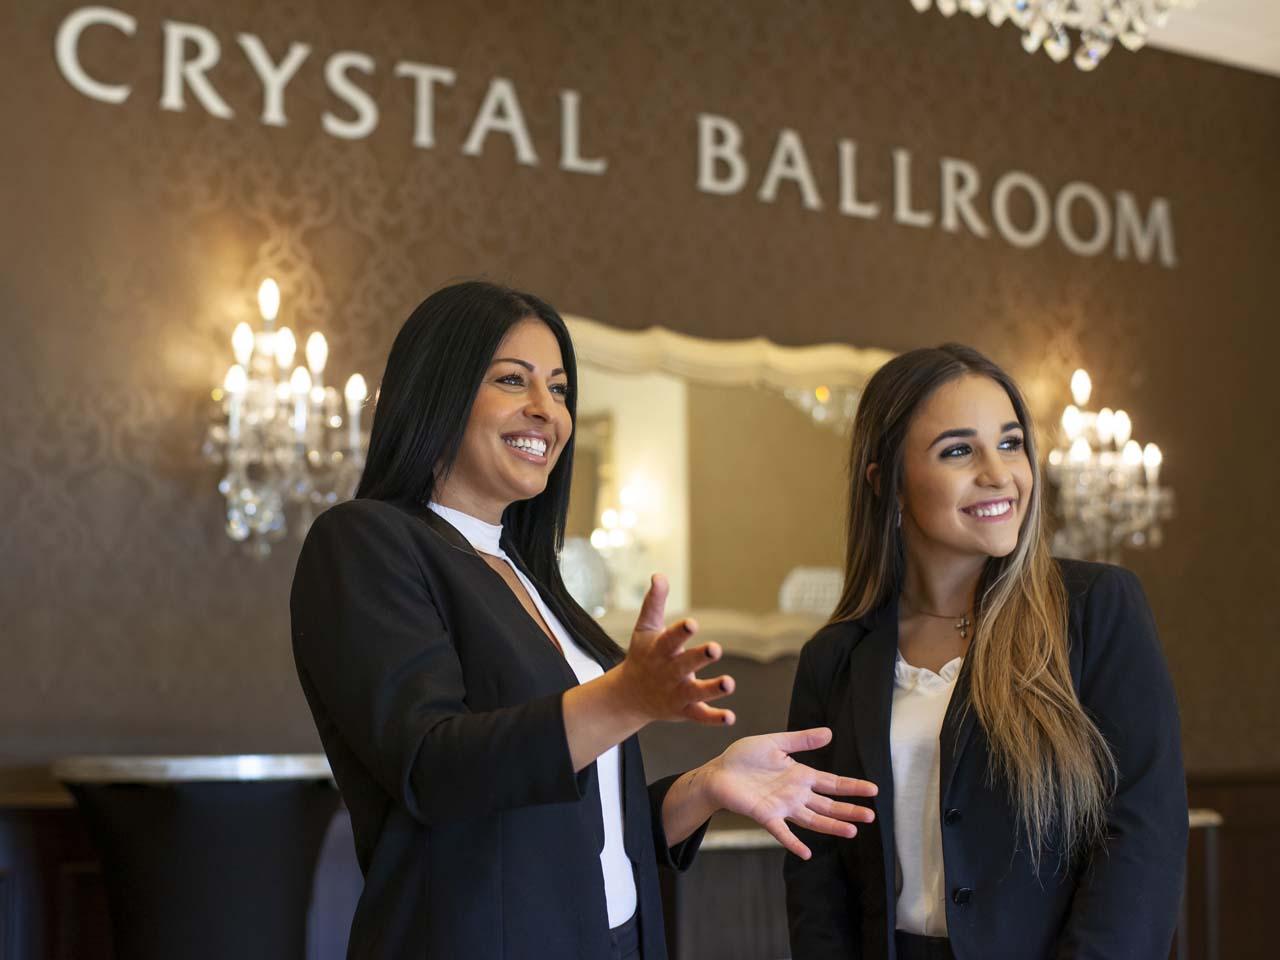 Final Crystal Ballroom_003